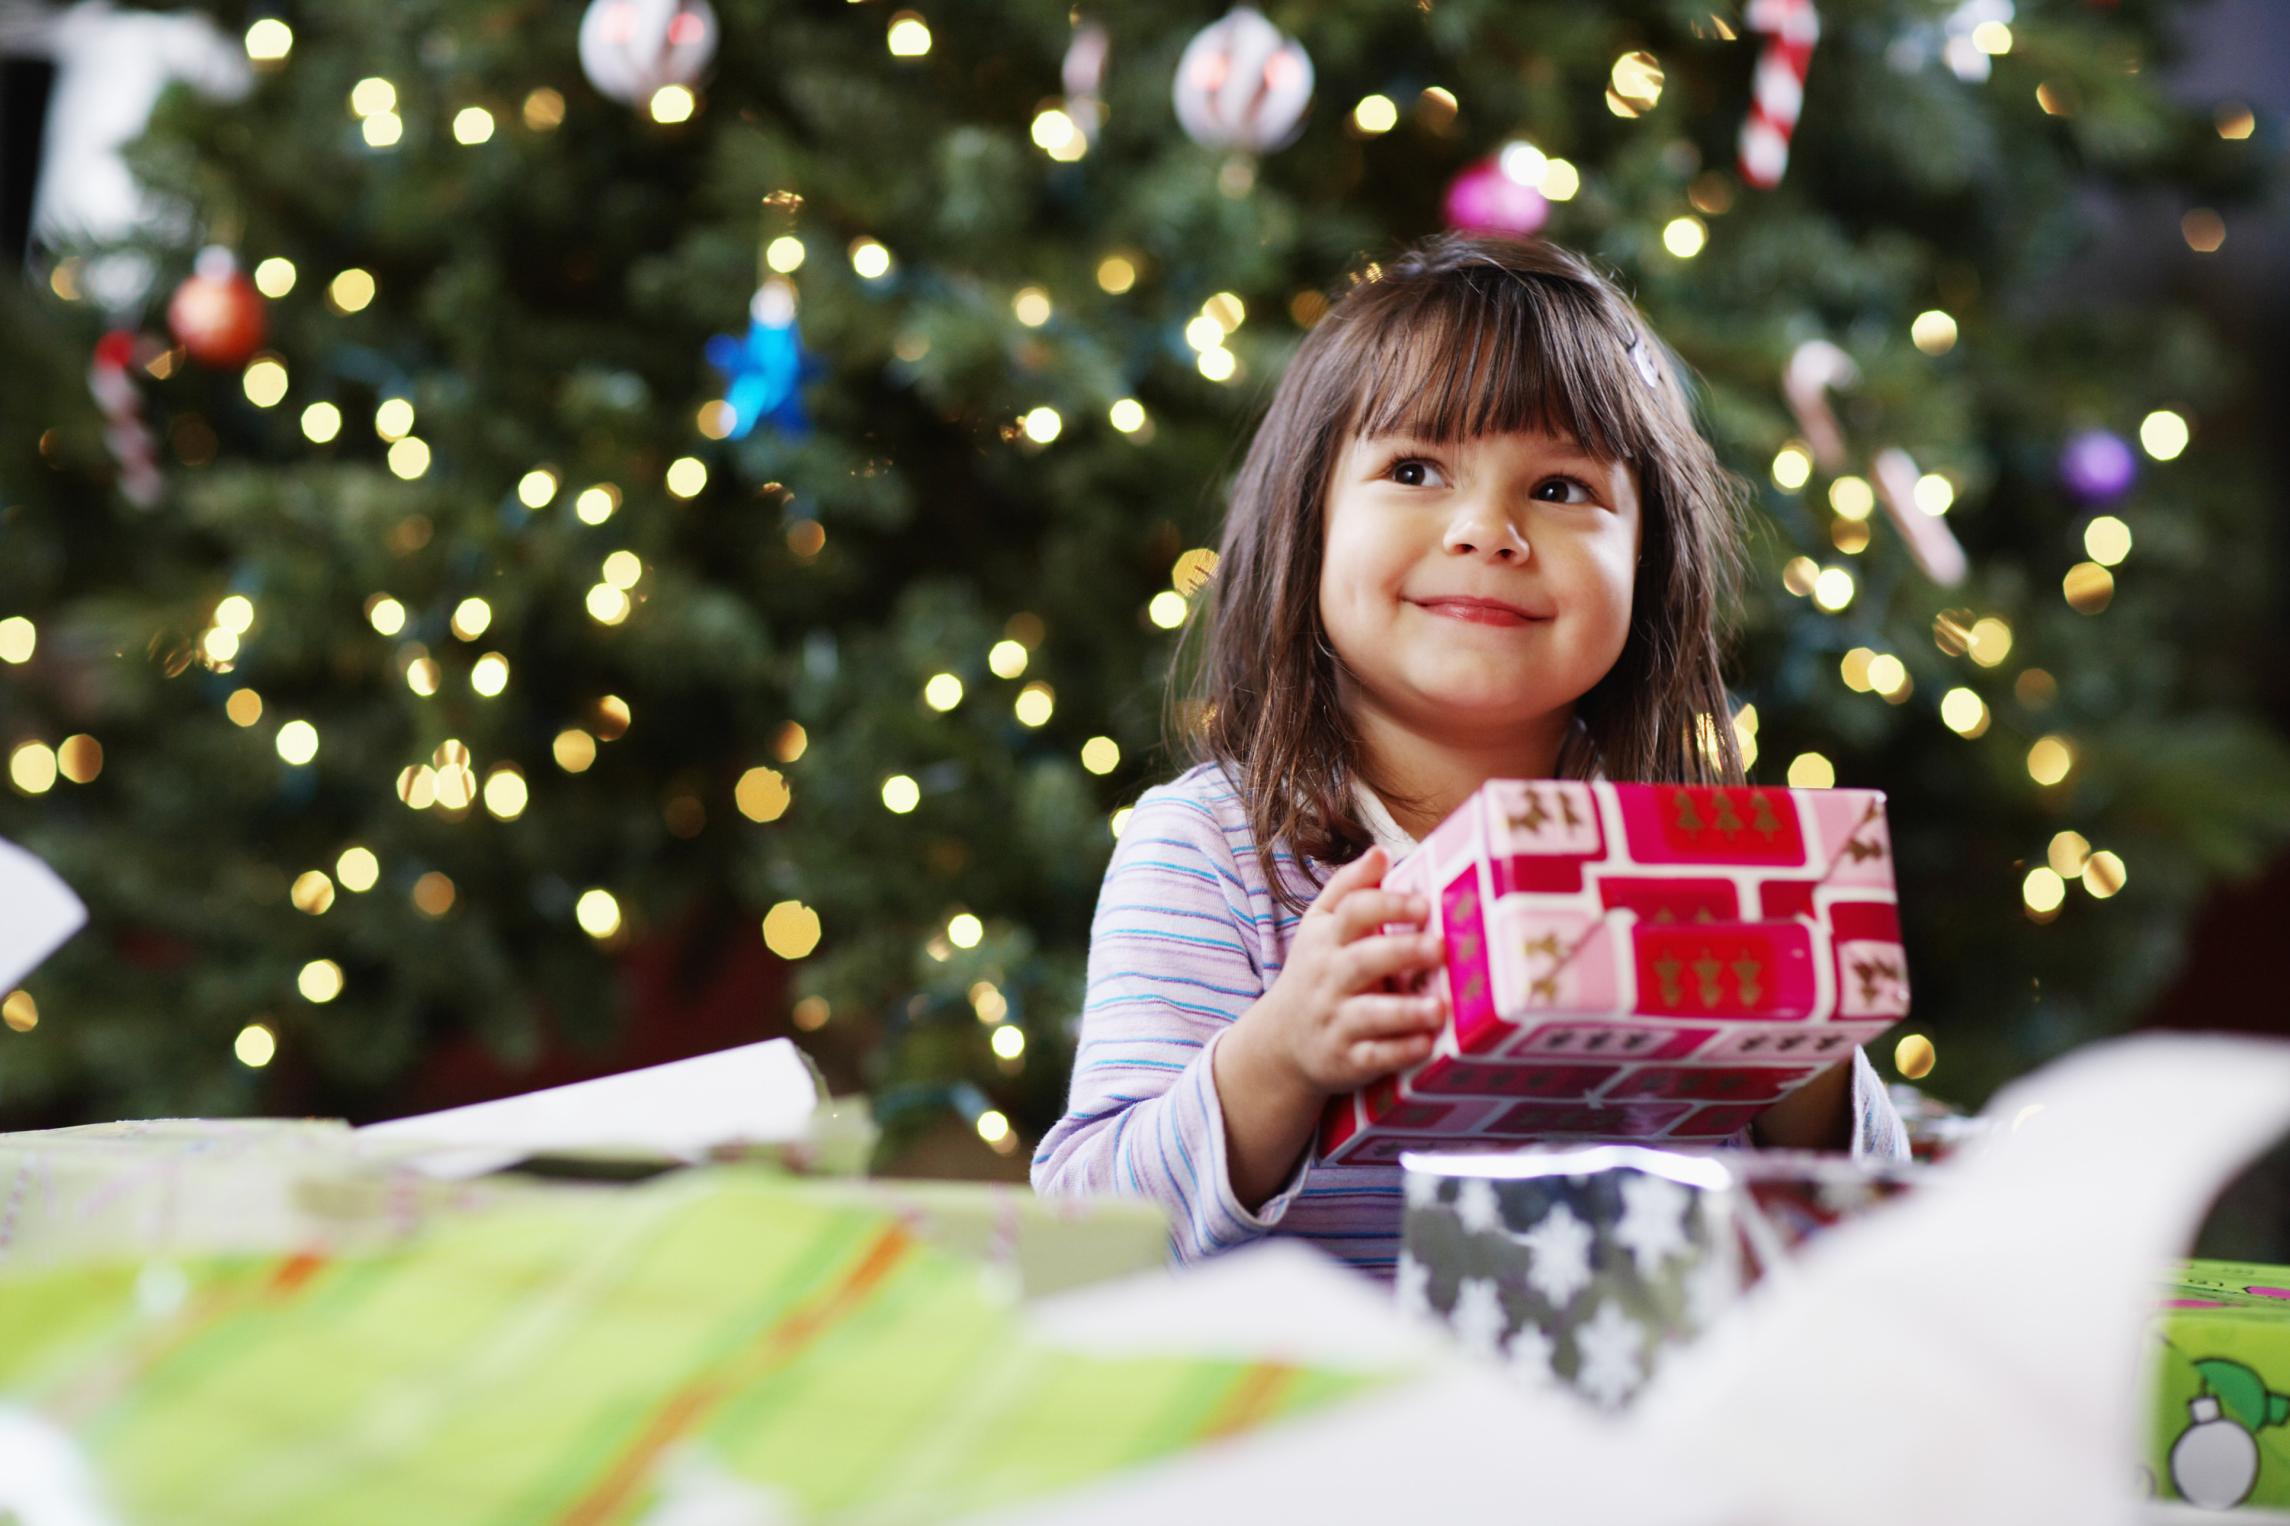 Christmas, gatherings and eternal treasures